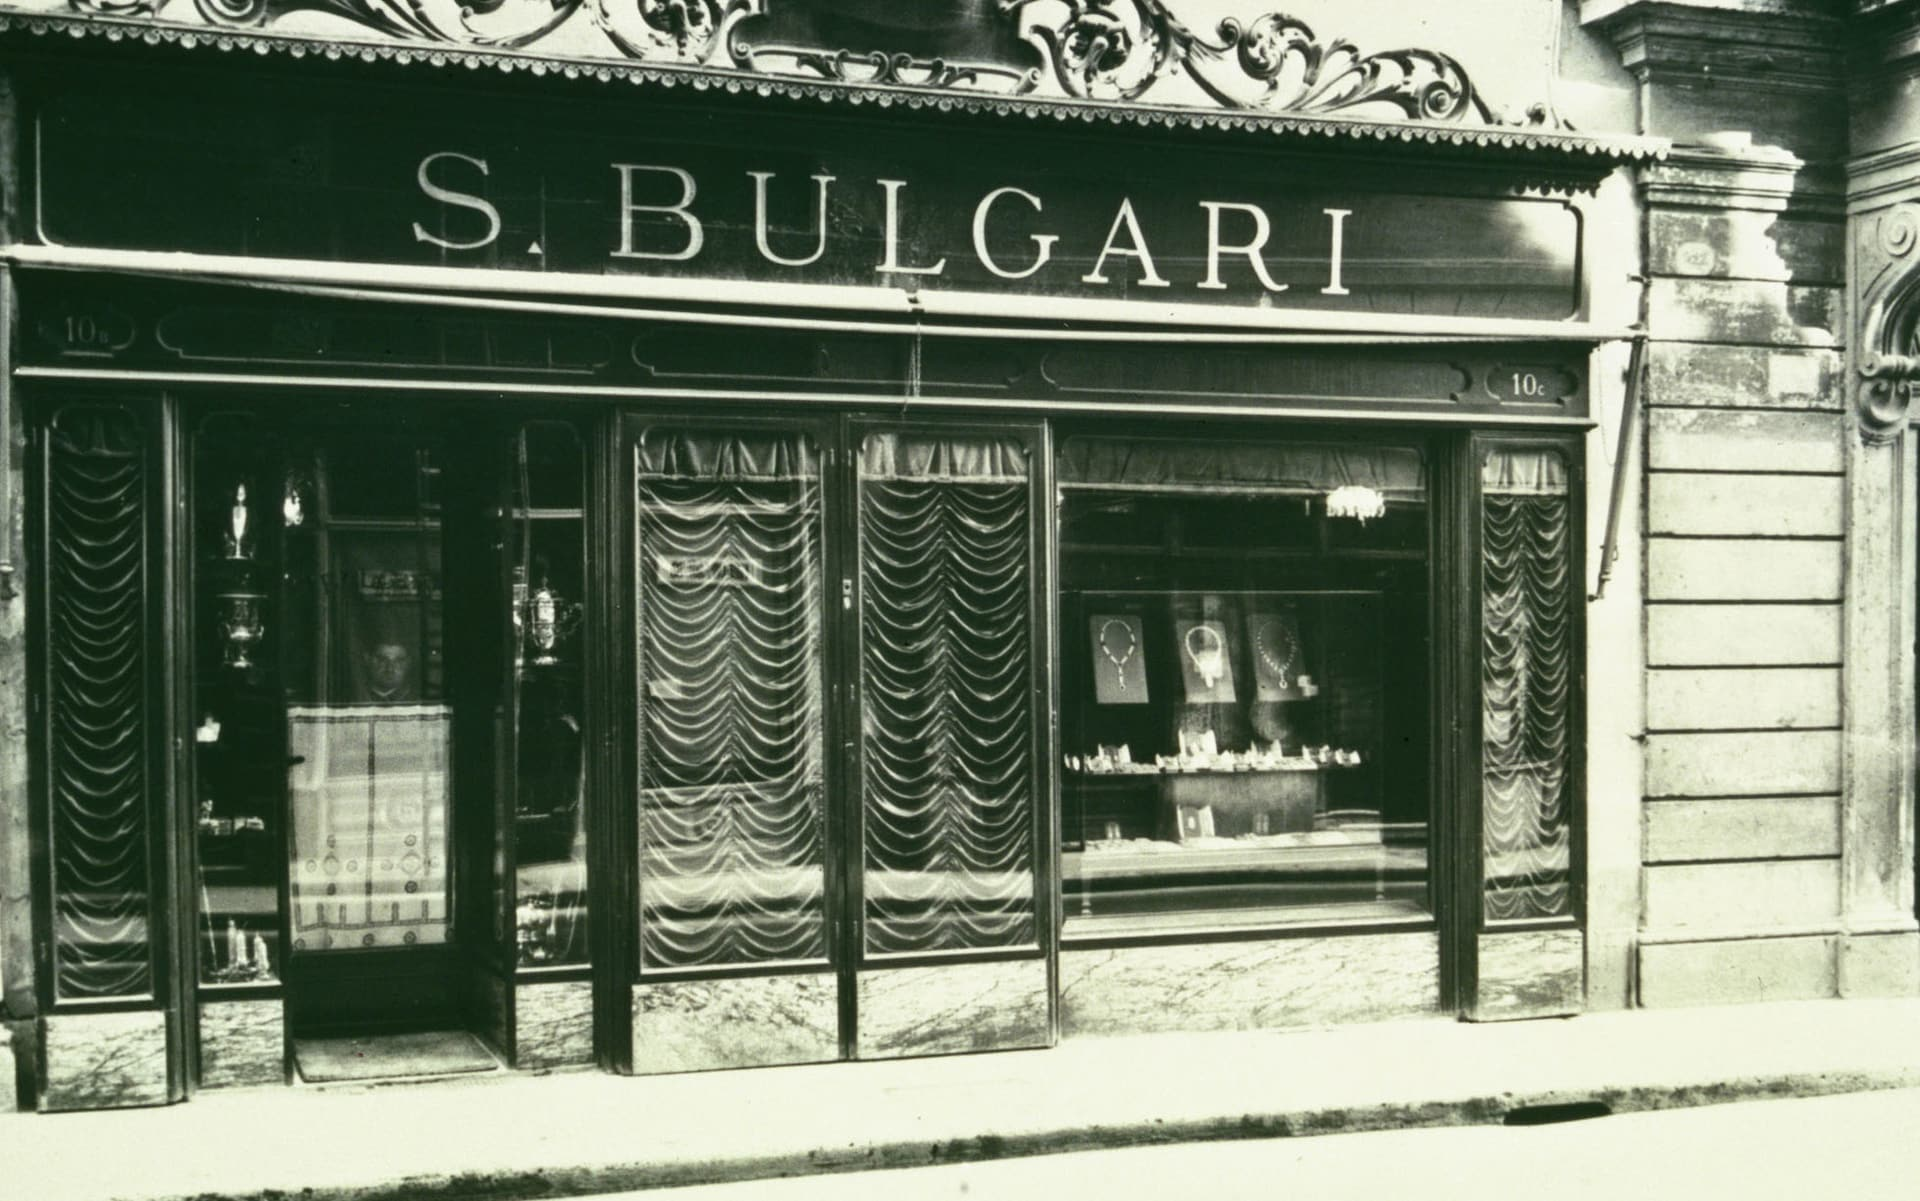 Sotirios Boulgaris' first store in Rome